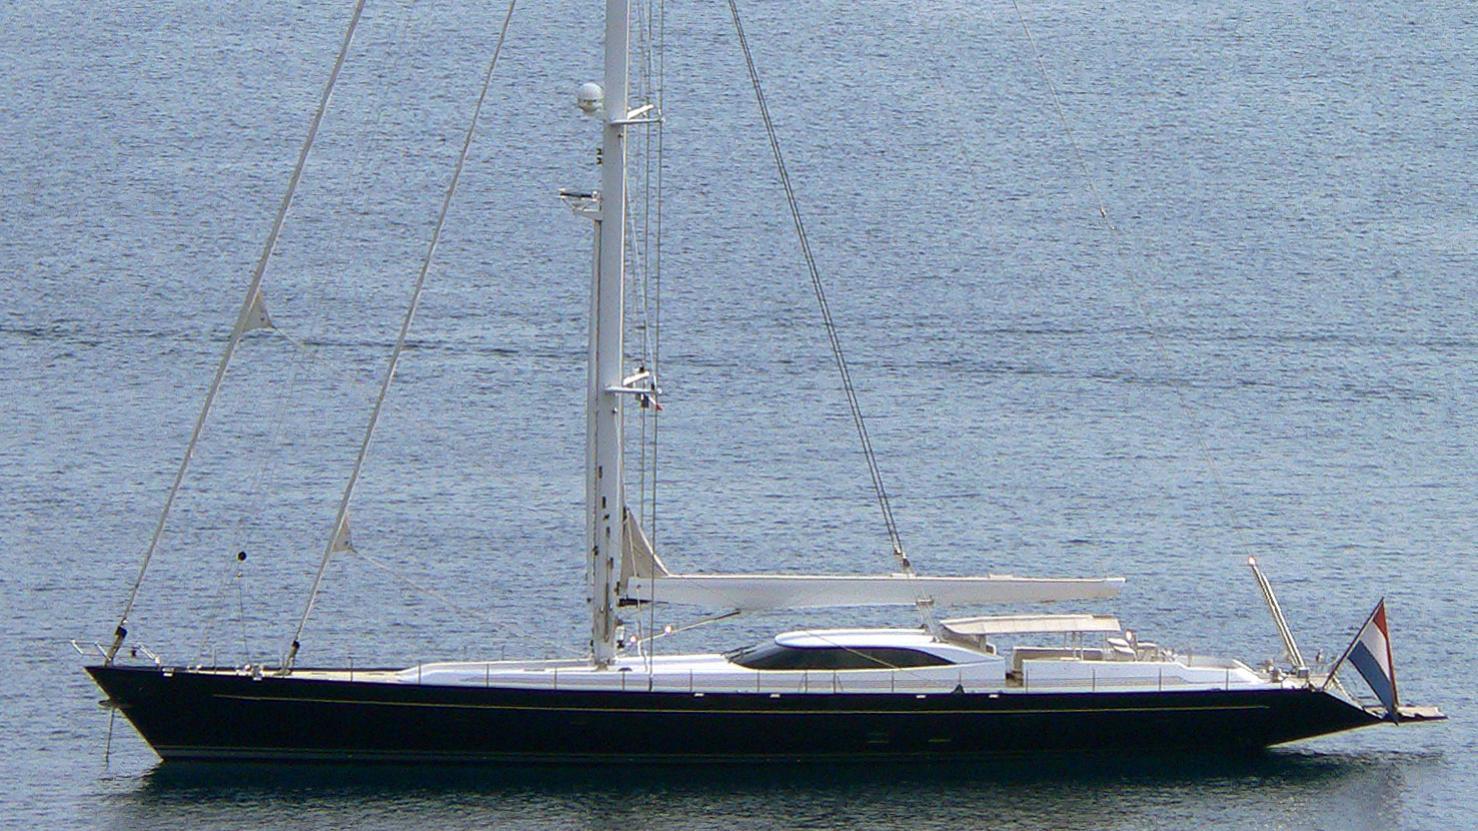 bella-ragazza-yacht-exterior